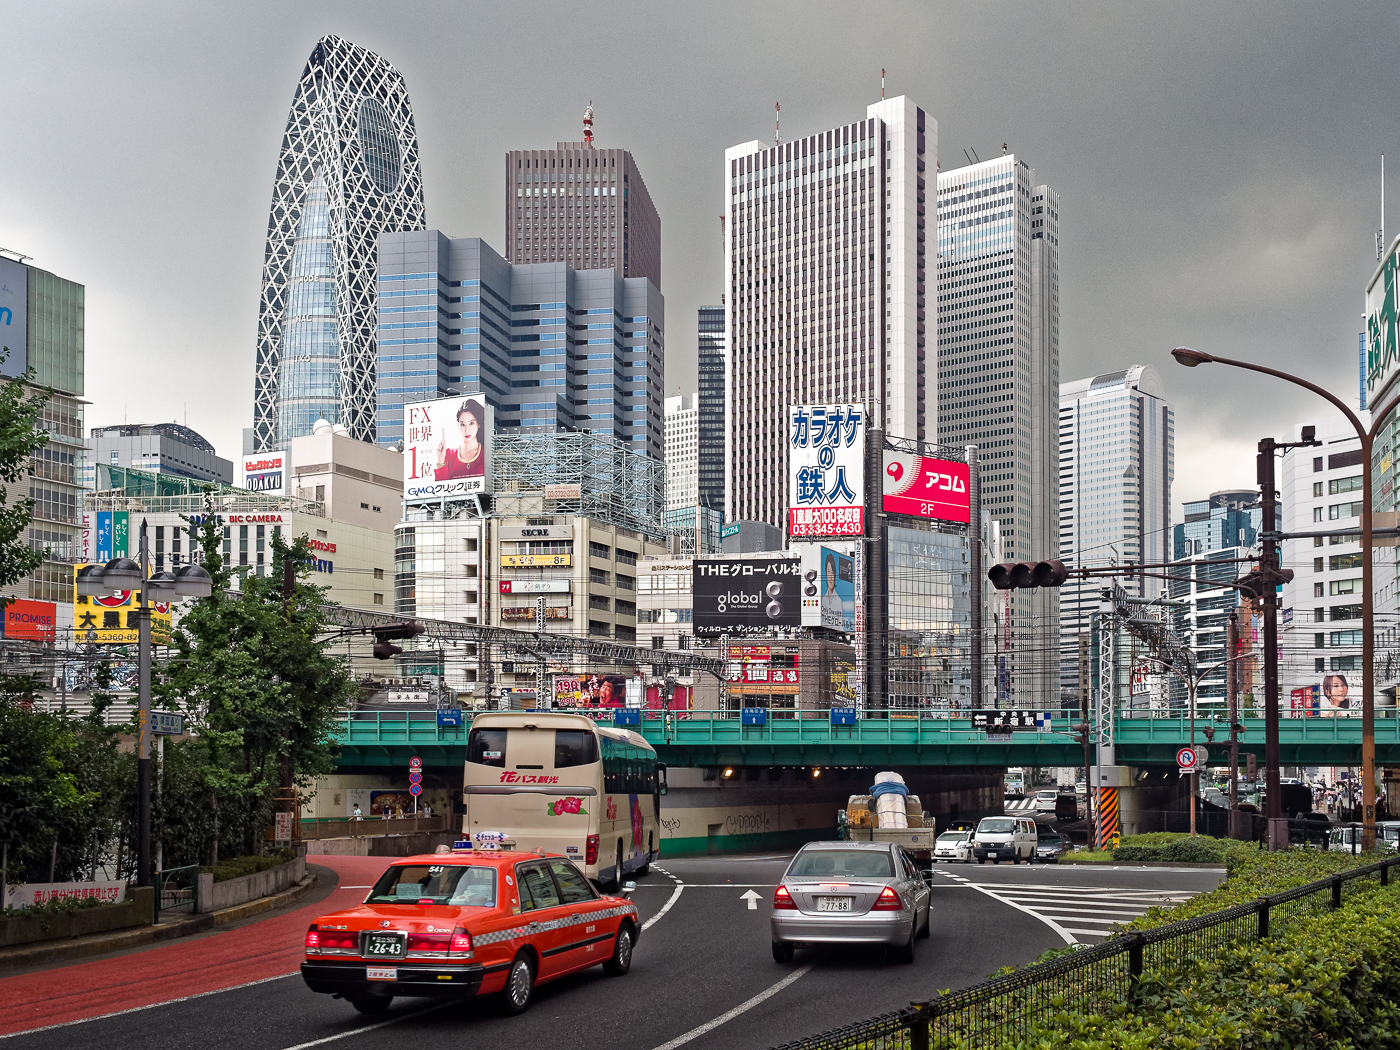 Shin-Osaka Station Hotel $79 ($̶1̶4̶7̶) - UPDATED 2018